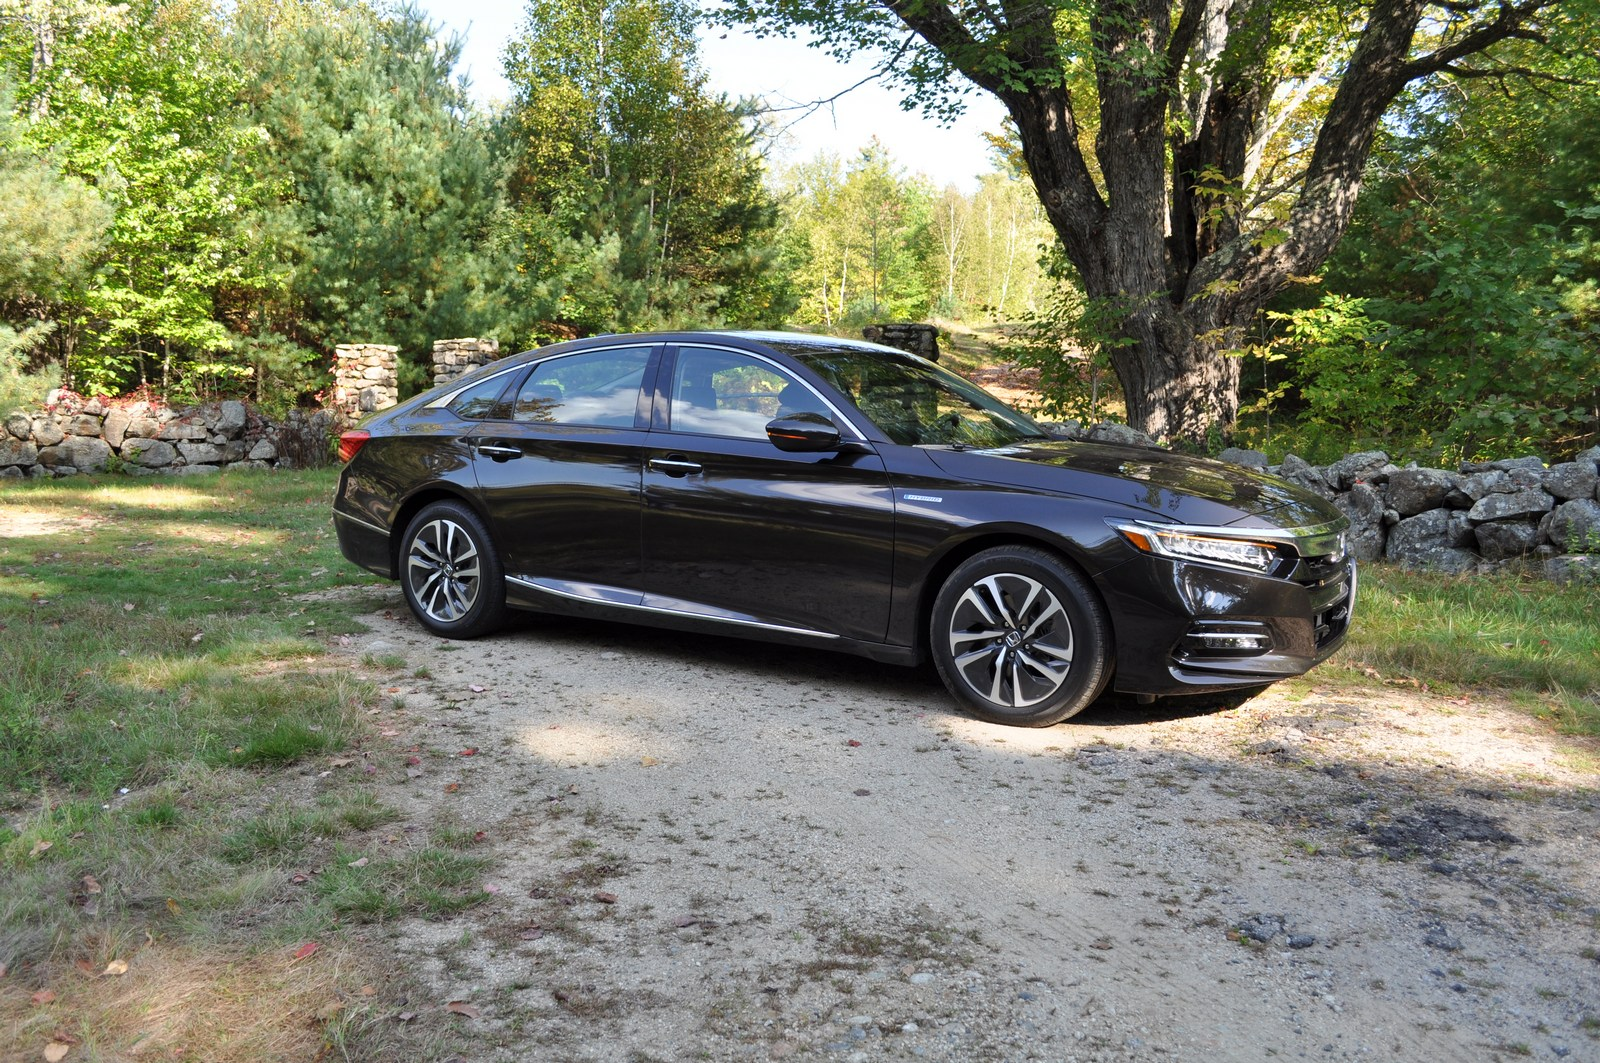 serving new honda at hybrid accord ex danbury detail of exlsedan l sedan